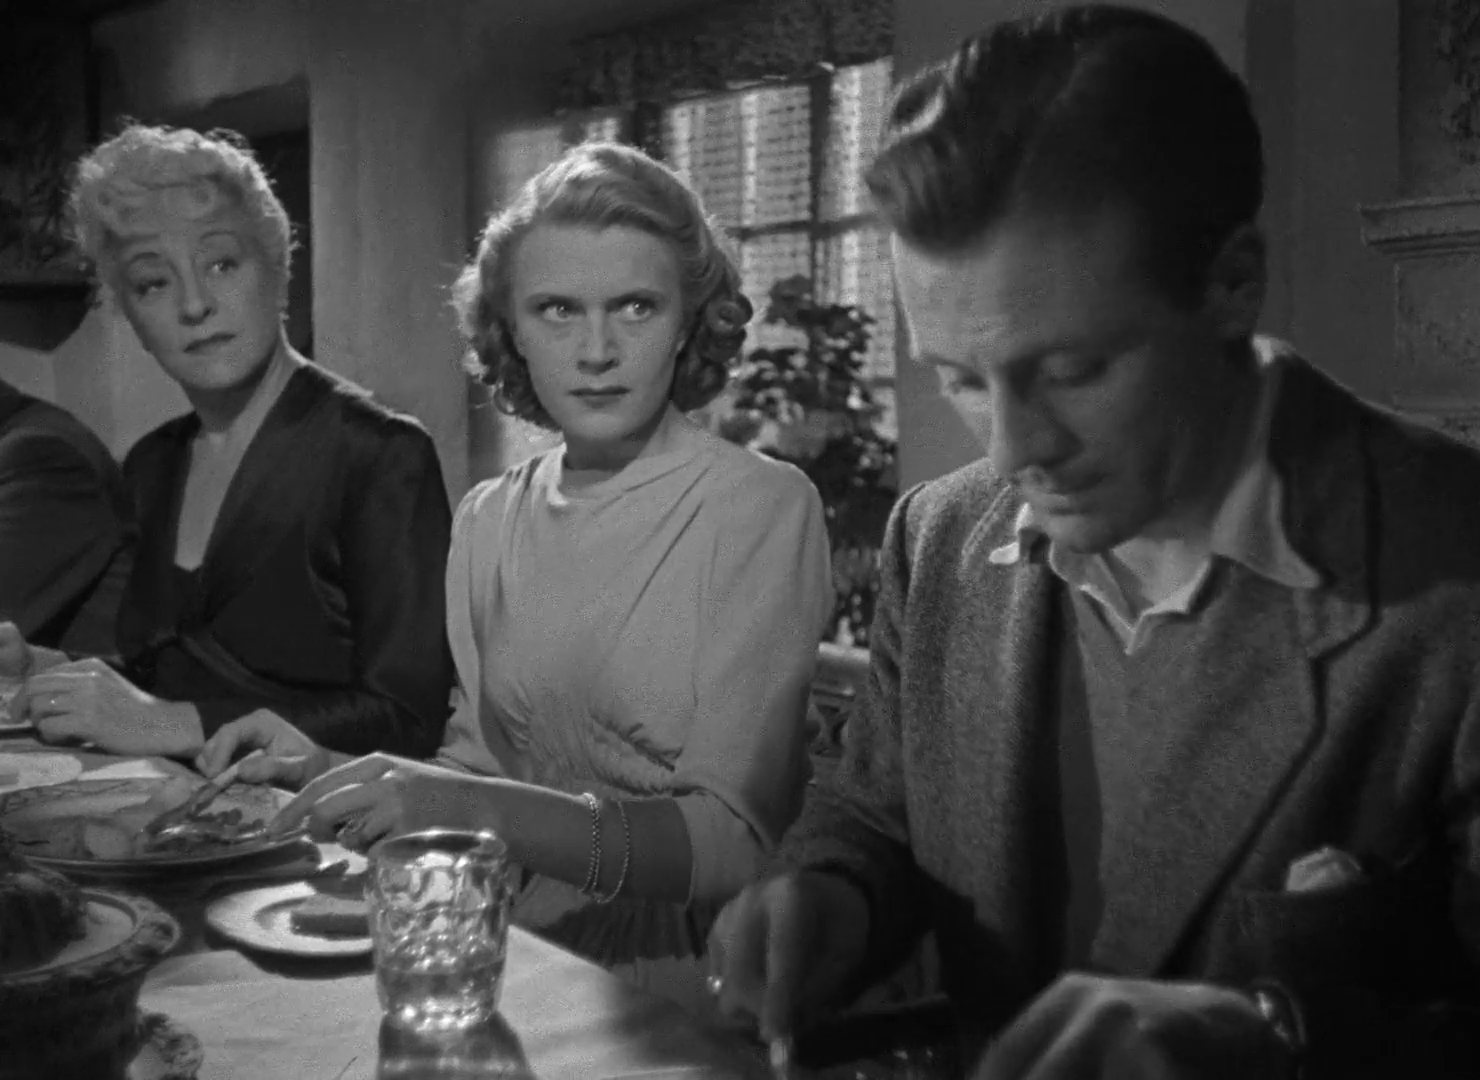 Image du film The halfway house (L'auberge fantôme, 1944) de Basil Dearden